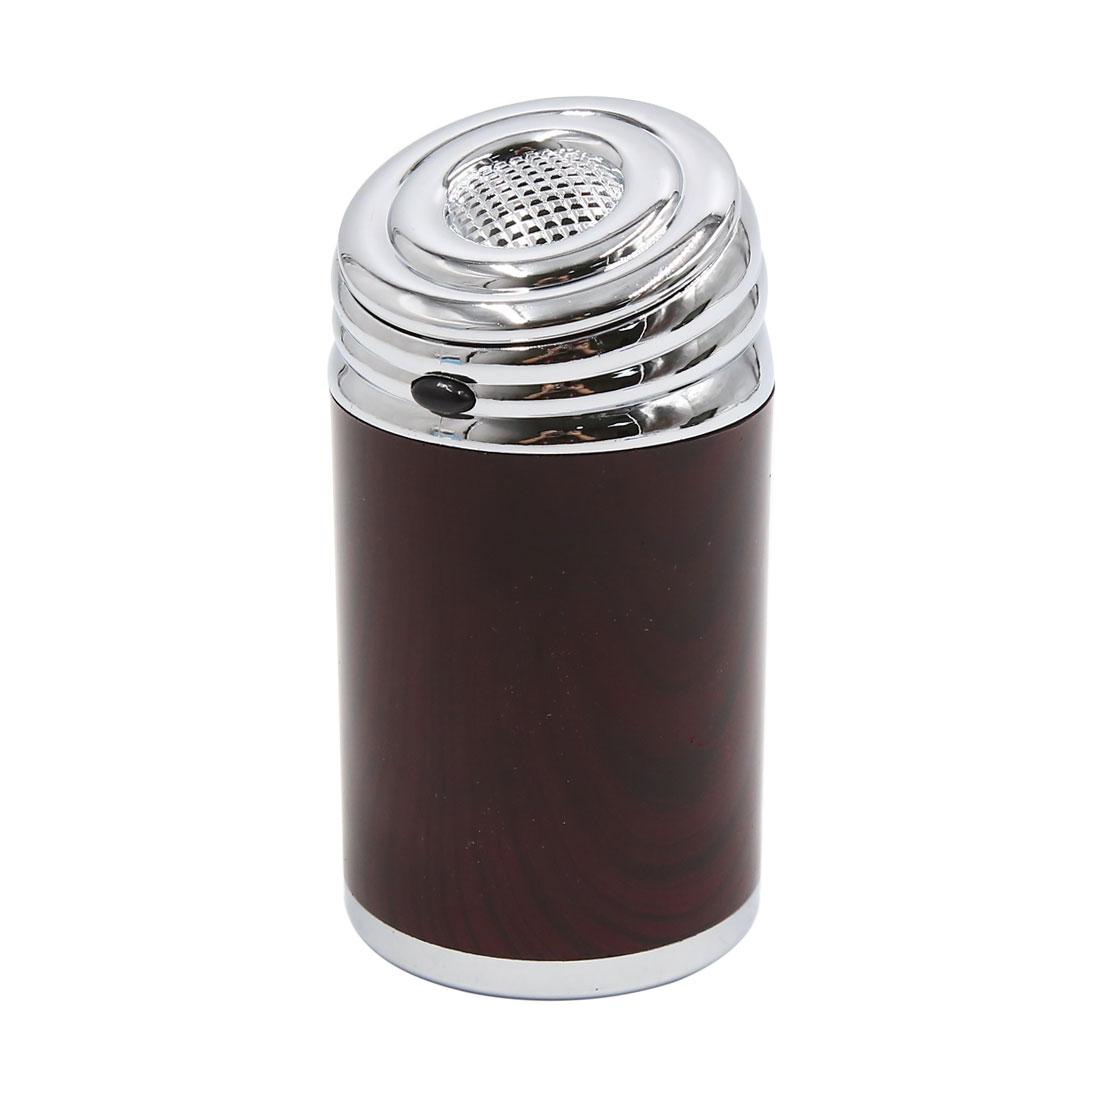 Portable Coffee Auto Car Blue Light LED Travel Cigarette Cylinder Ashtray Holder